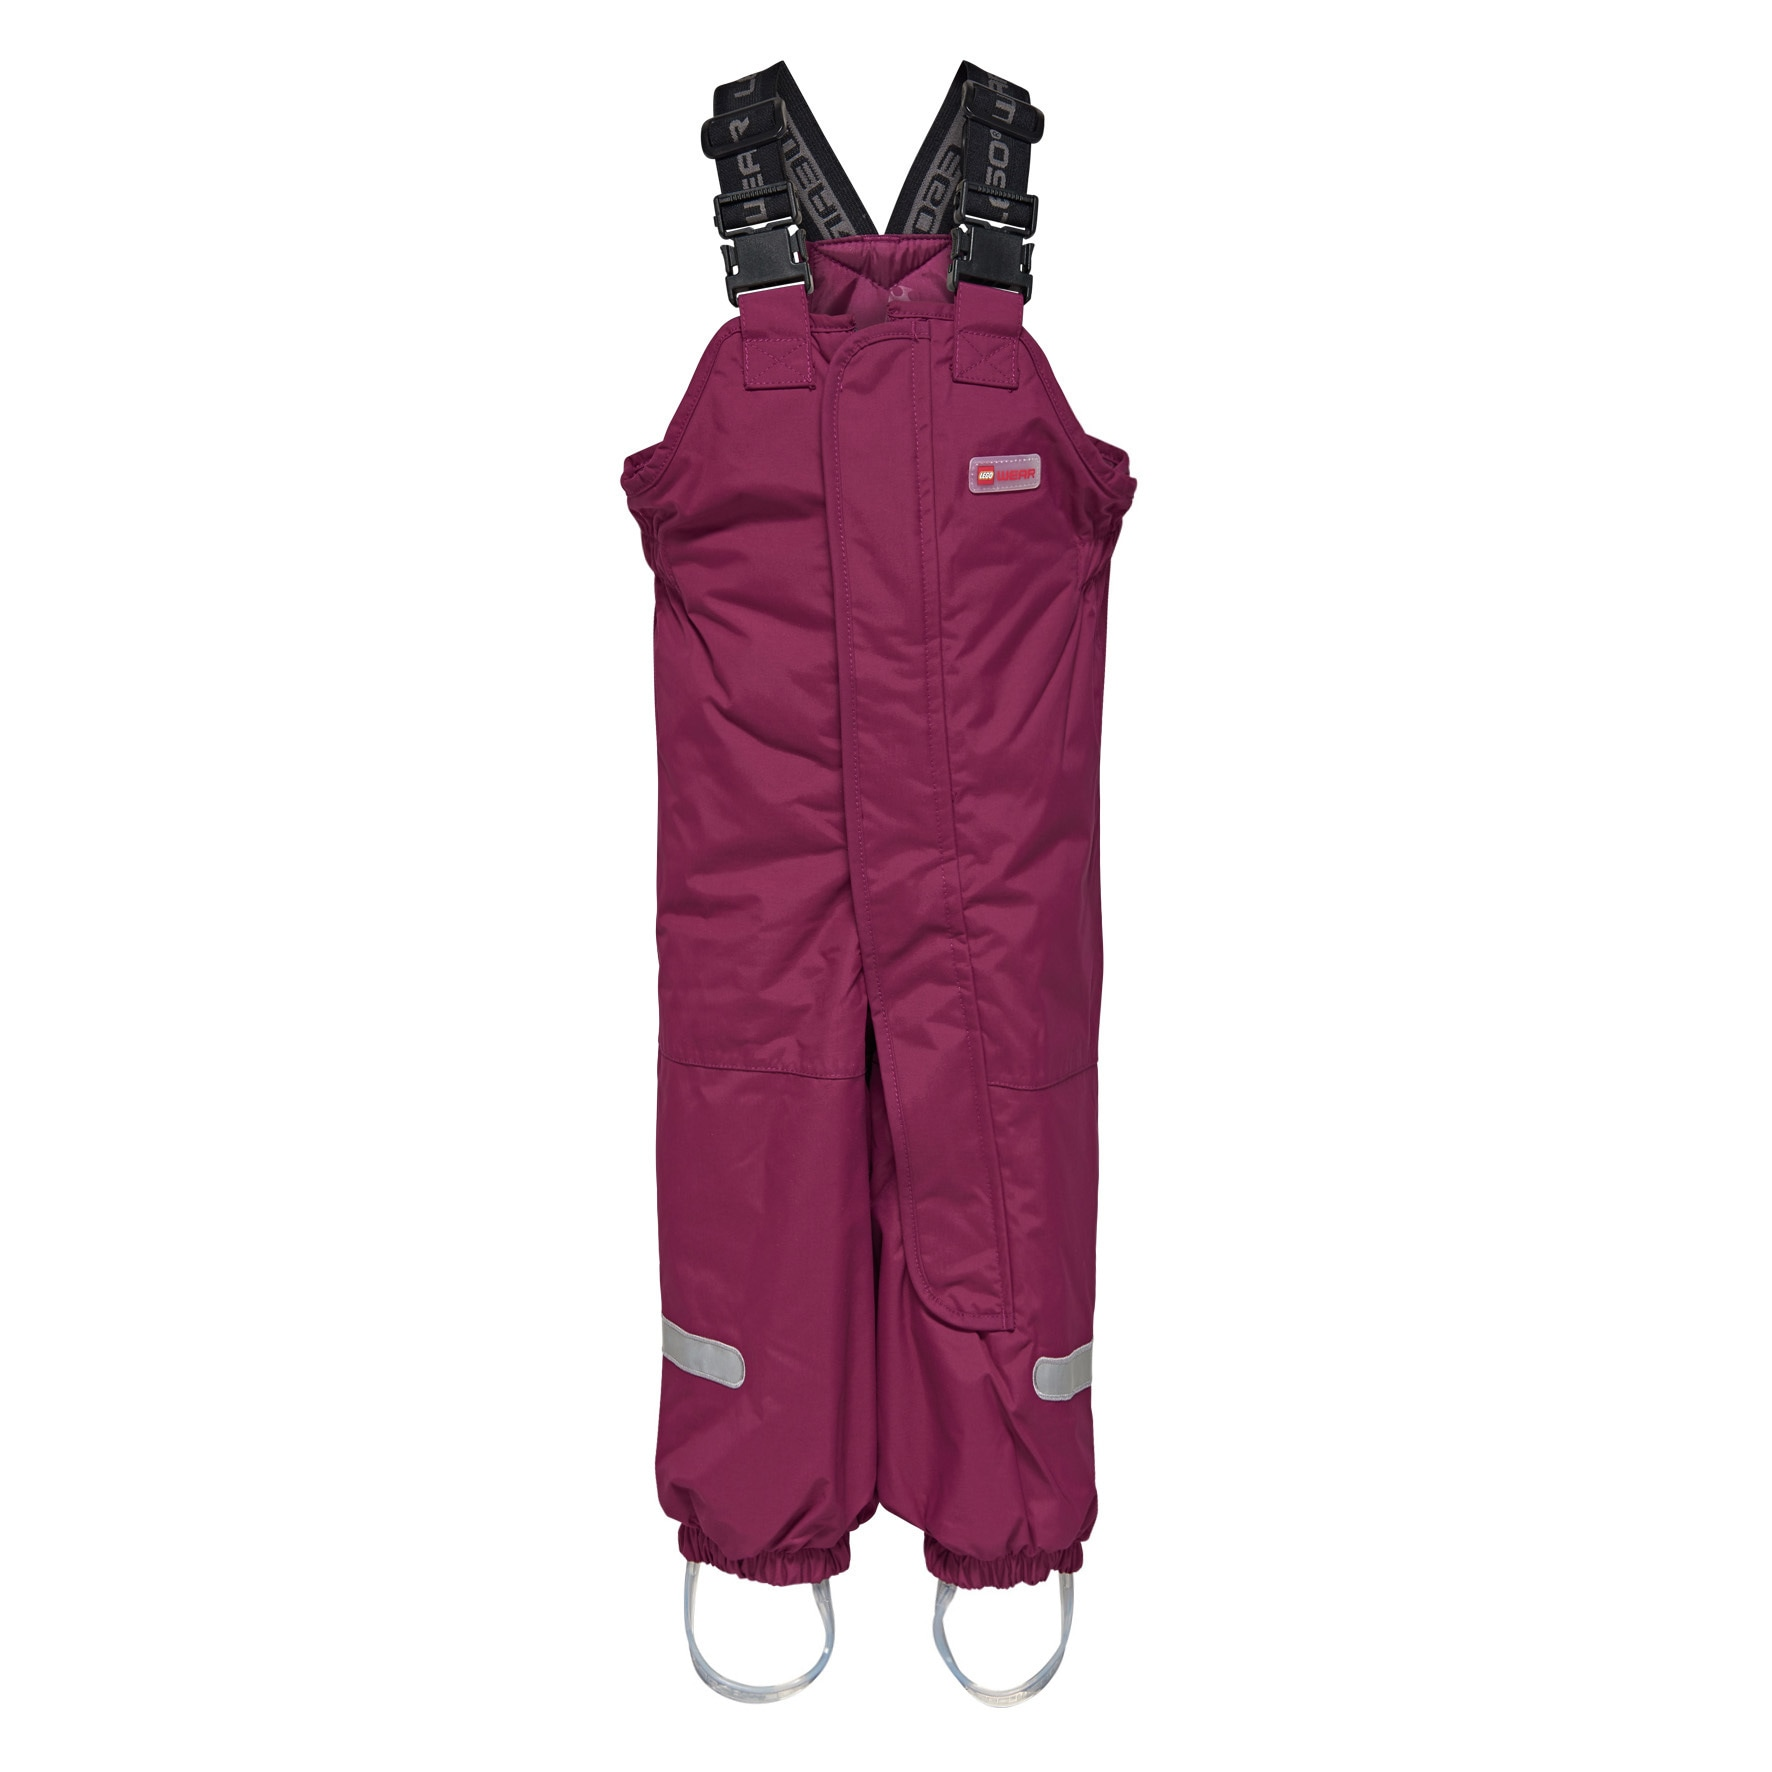 LEGO Wear Skihose PENN 770 rot Jungen Ski-Bekleidung Ski Sportarten